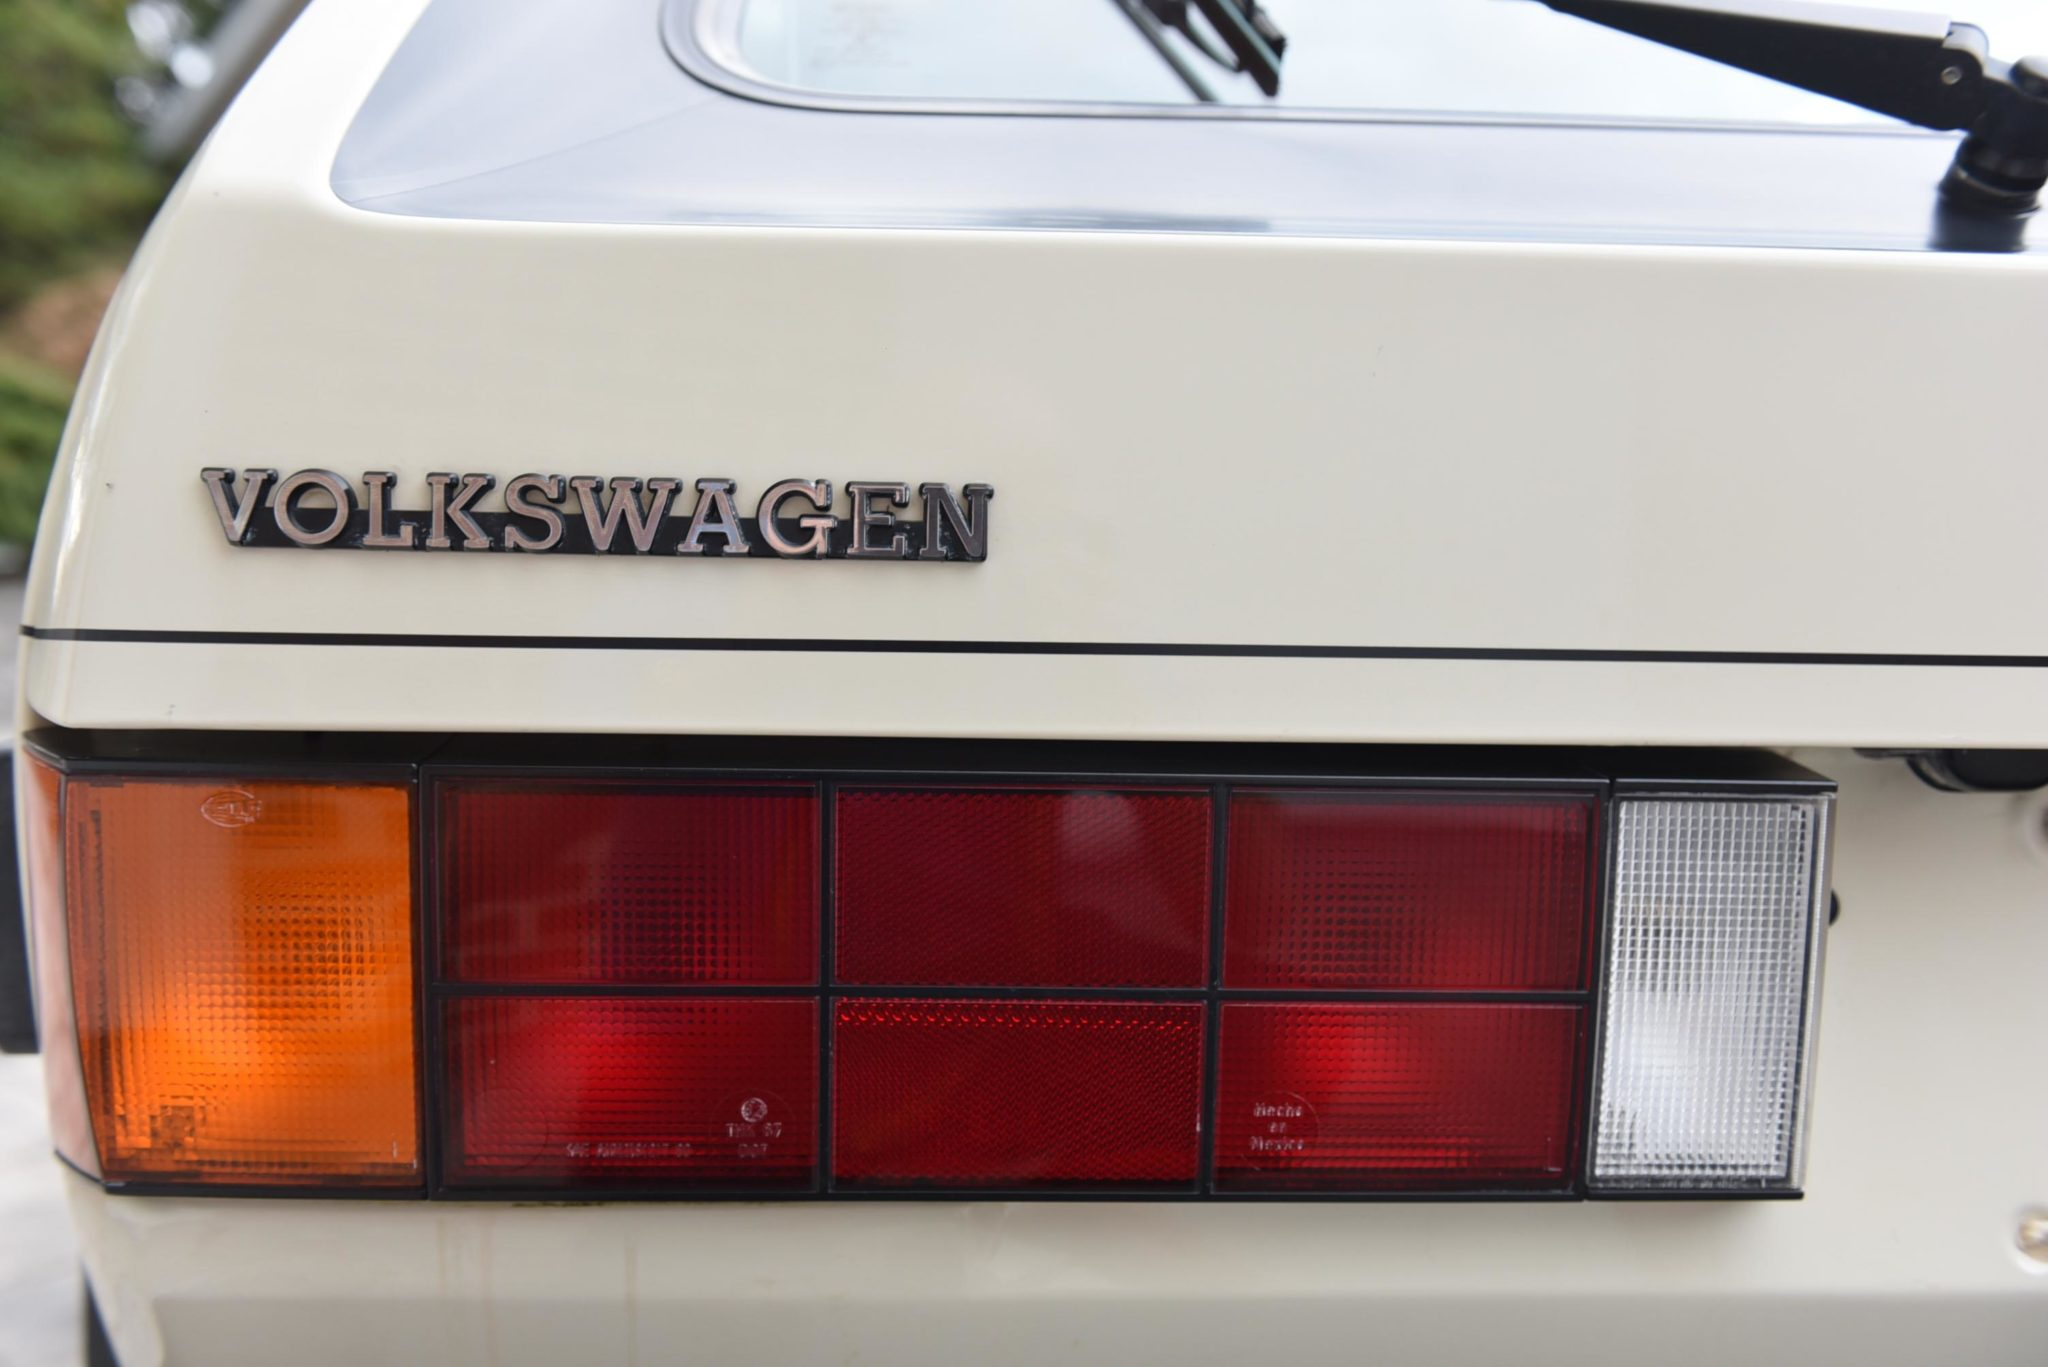 1983_volkswagen_rabbit_gti_1587038754b9c27f8dLEM_9923-scaled